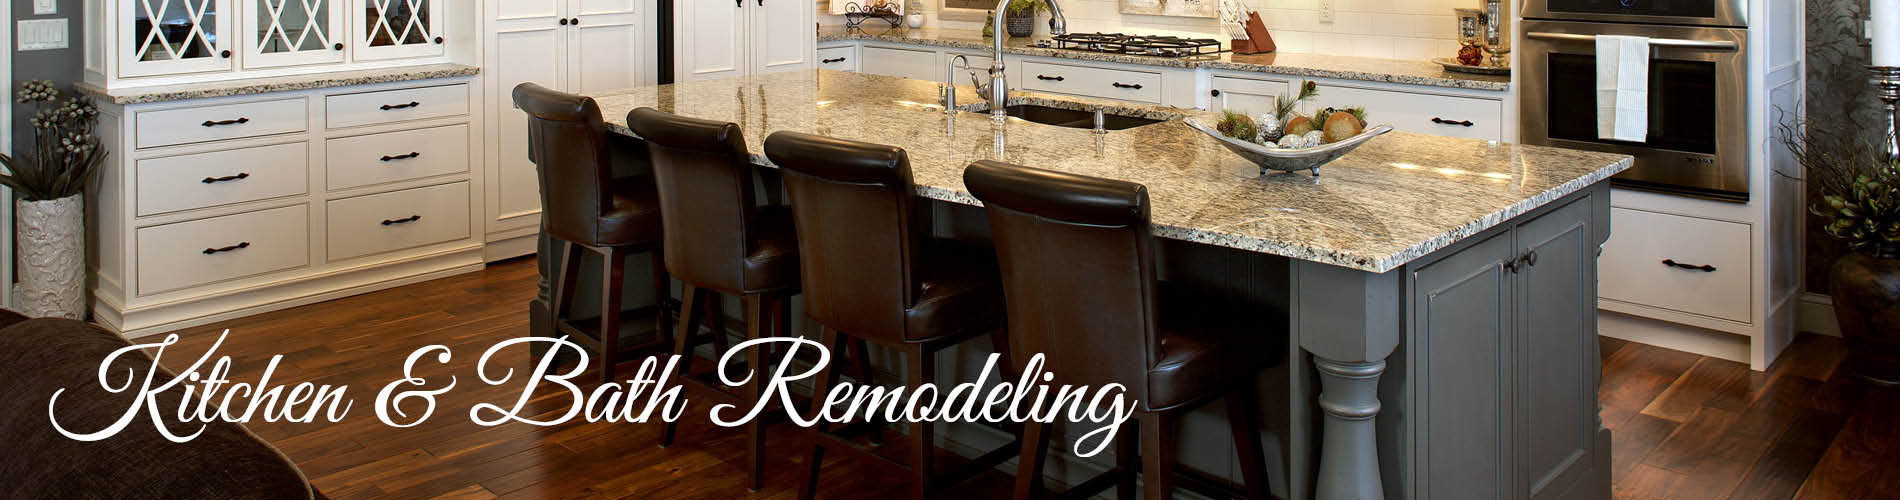 Premium Flooring Cabinetry Granite Quartz For Your New Construction Or Remodel Bourbonnais Il Mountain